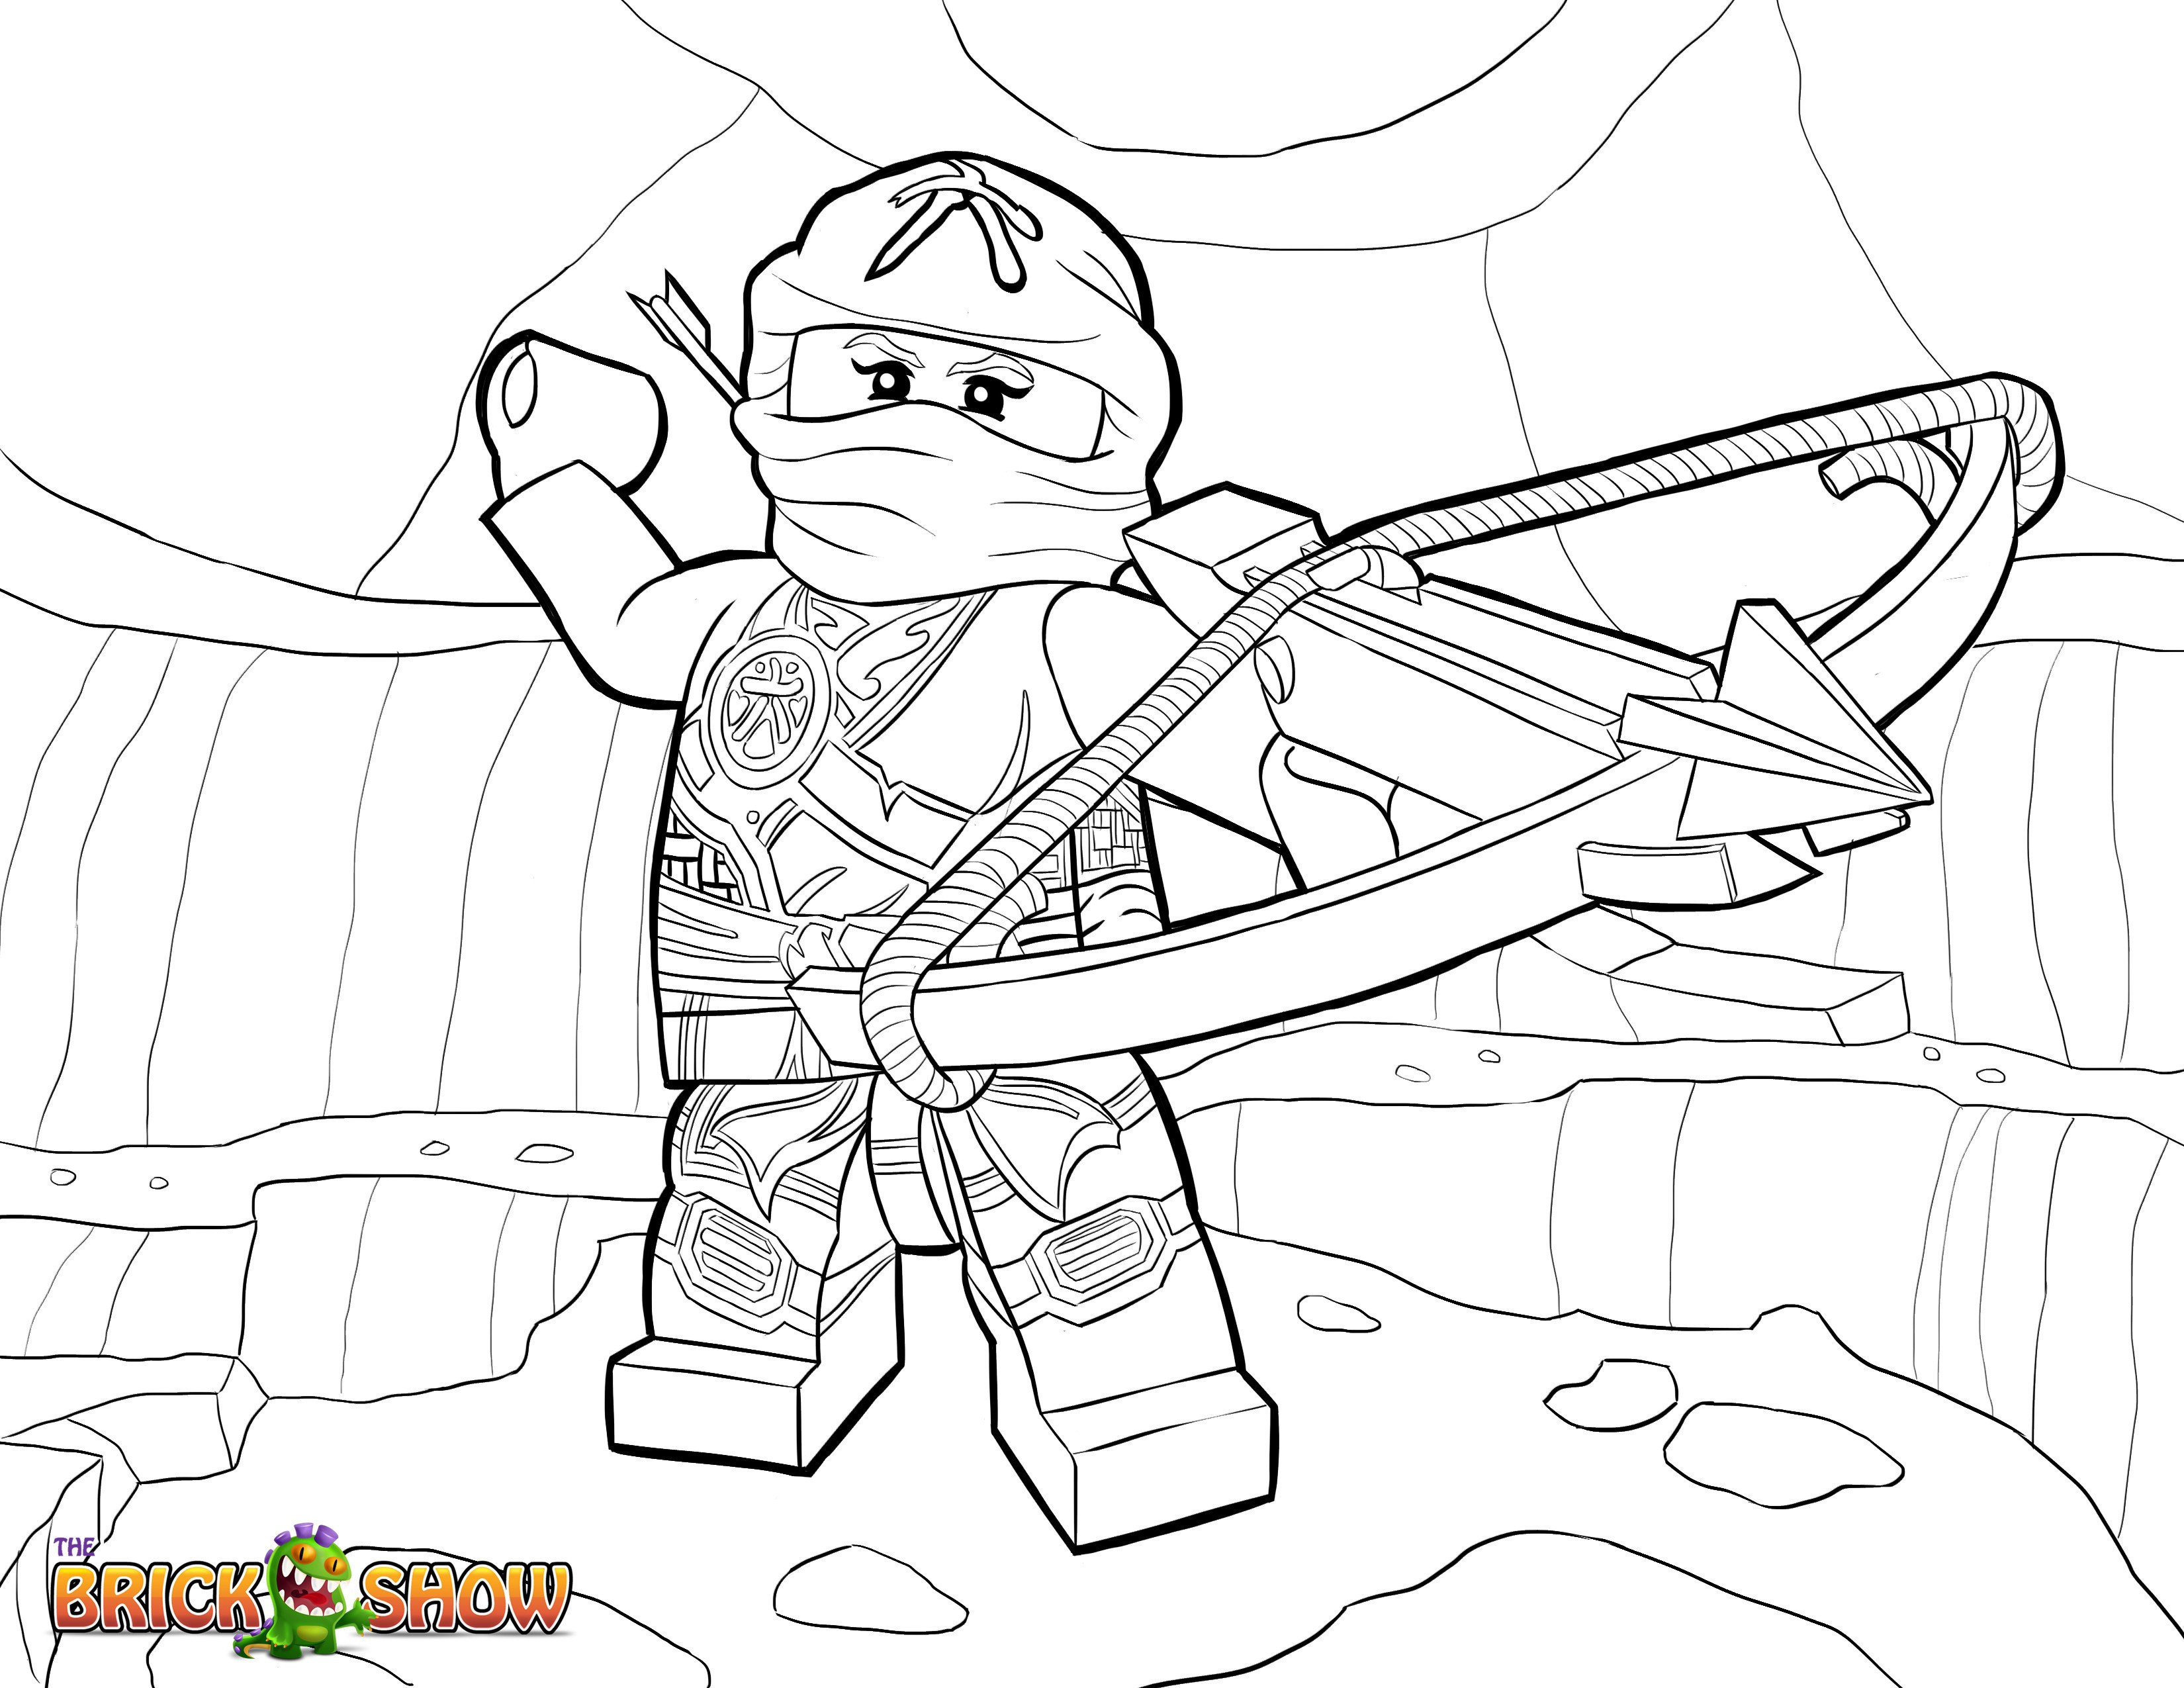 Ninjago Morro Ausmalbilder Einzigartig Ausmalbilder Lego Ninjago Morro Schön Malvorlagen Ninjago Lloyd Neu Bild